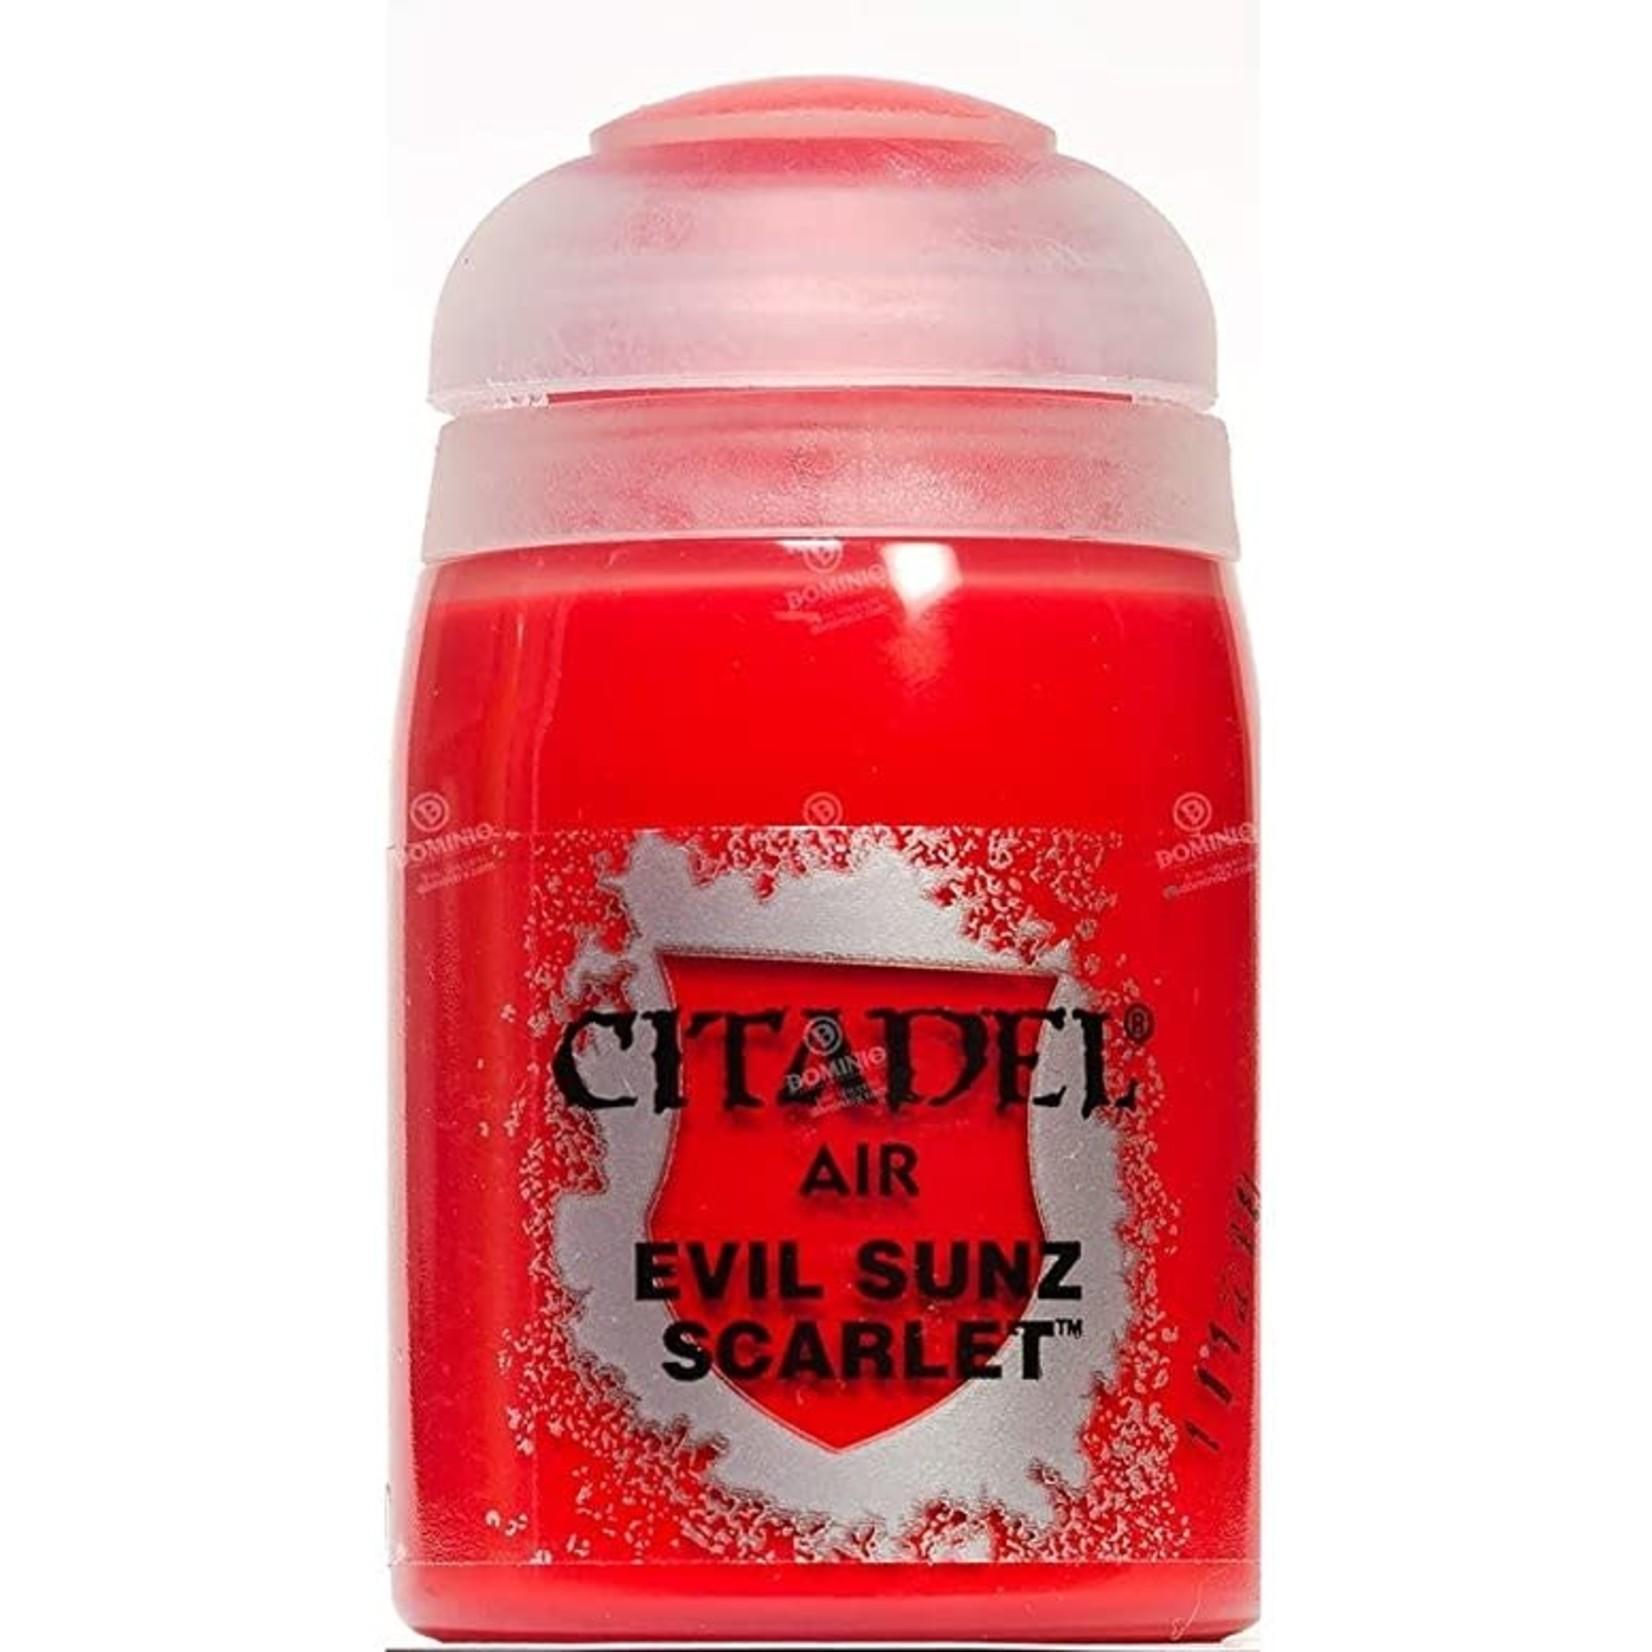 Games Workshop Citadel Paint: Evil Sunz Scarlet Air (24 ml)